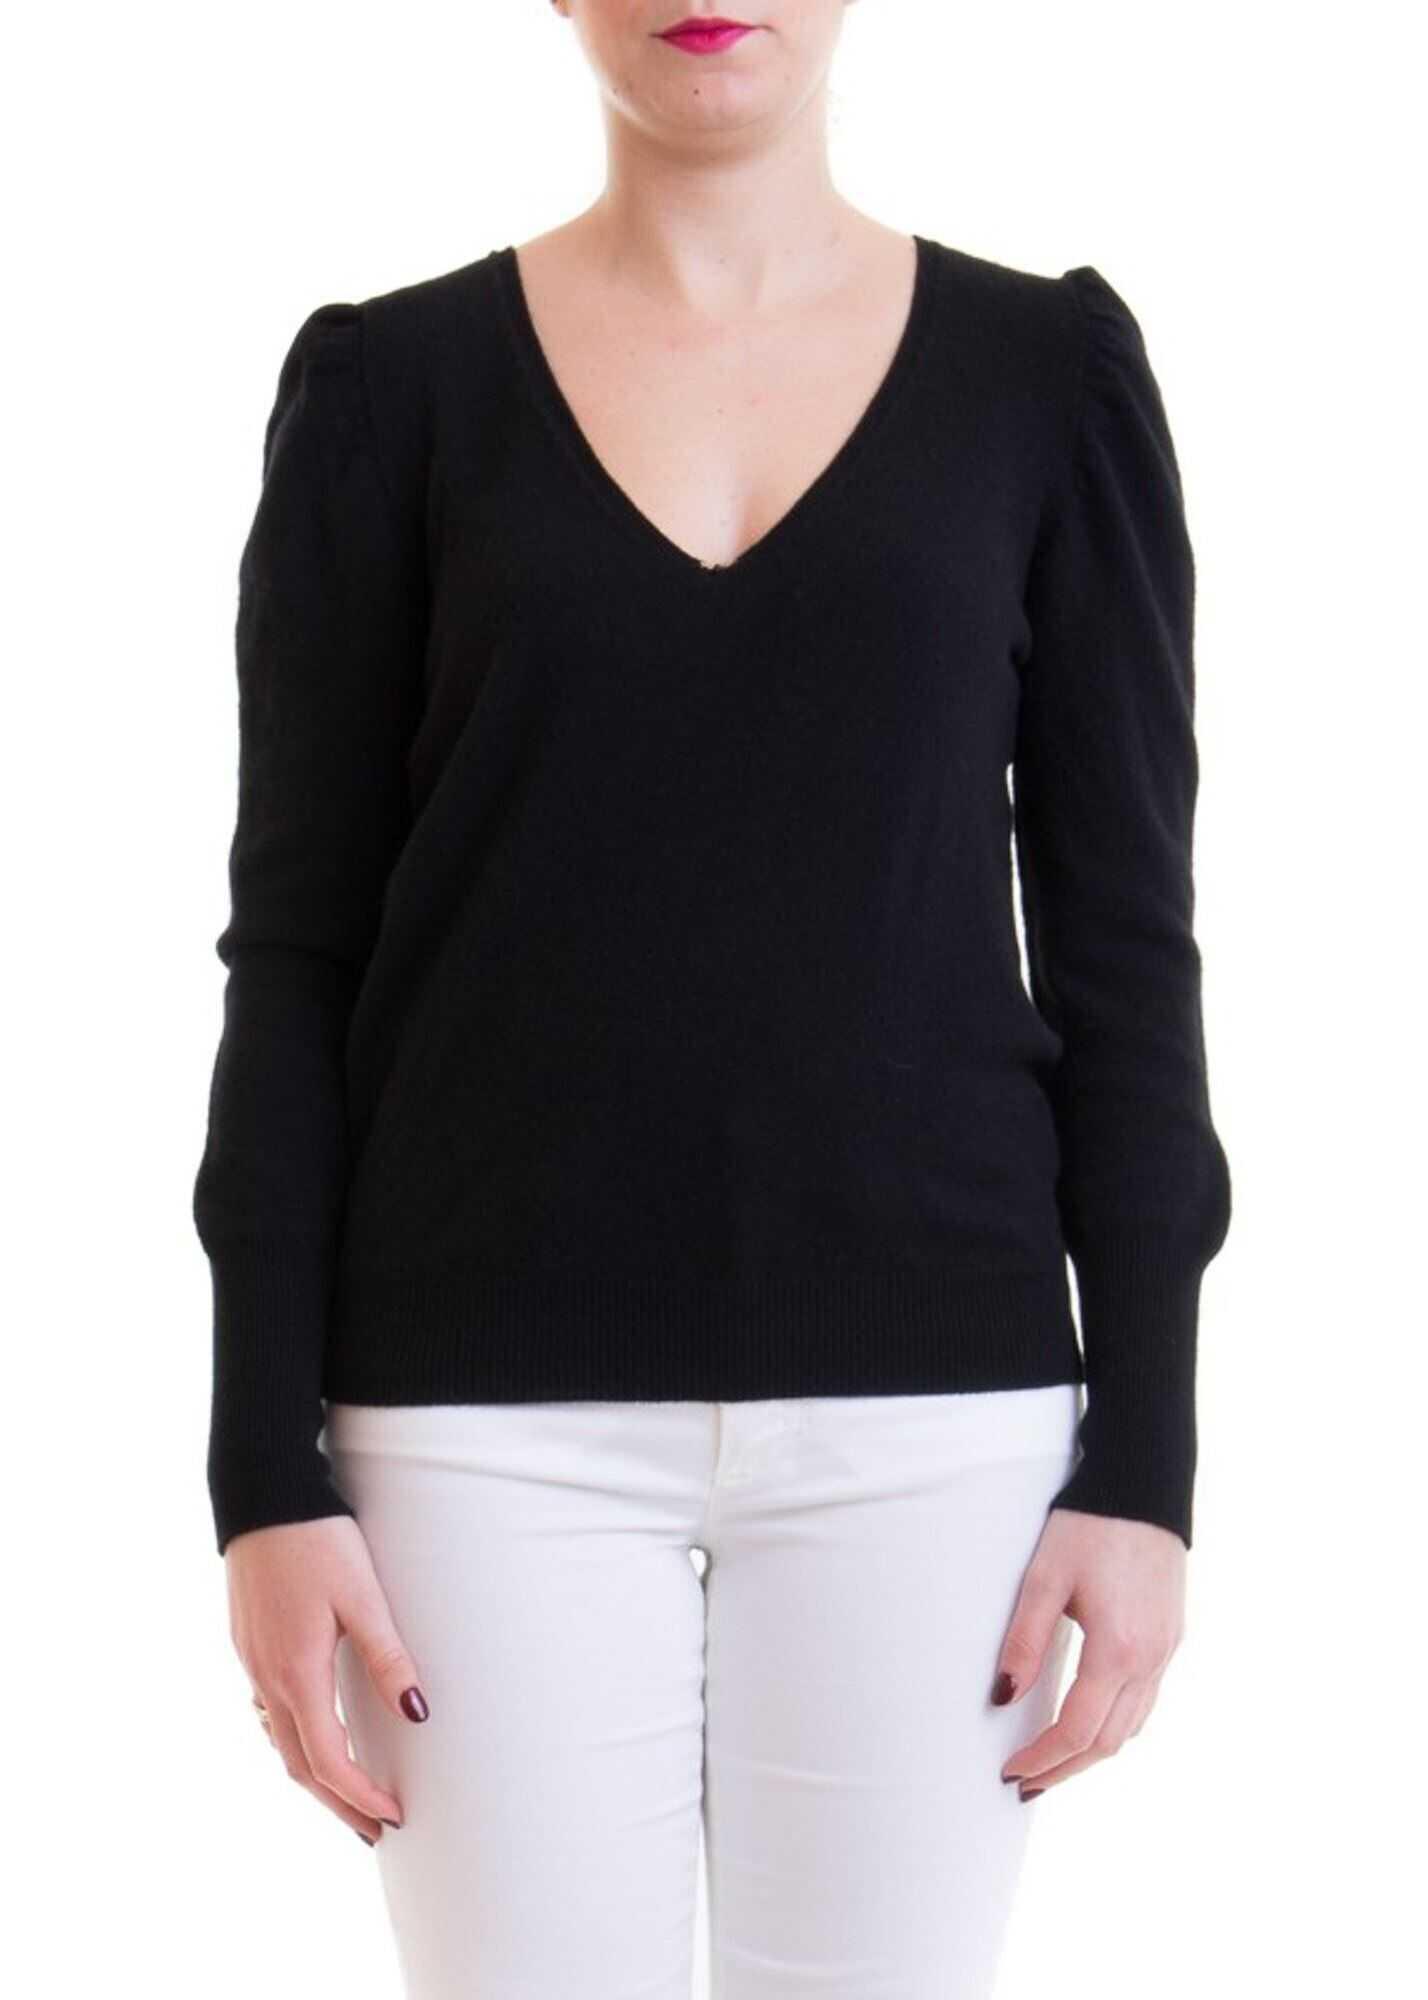 Blumarine Cashmere Blend Sweater Black